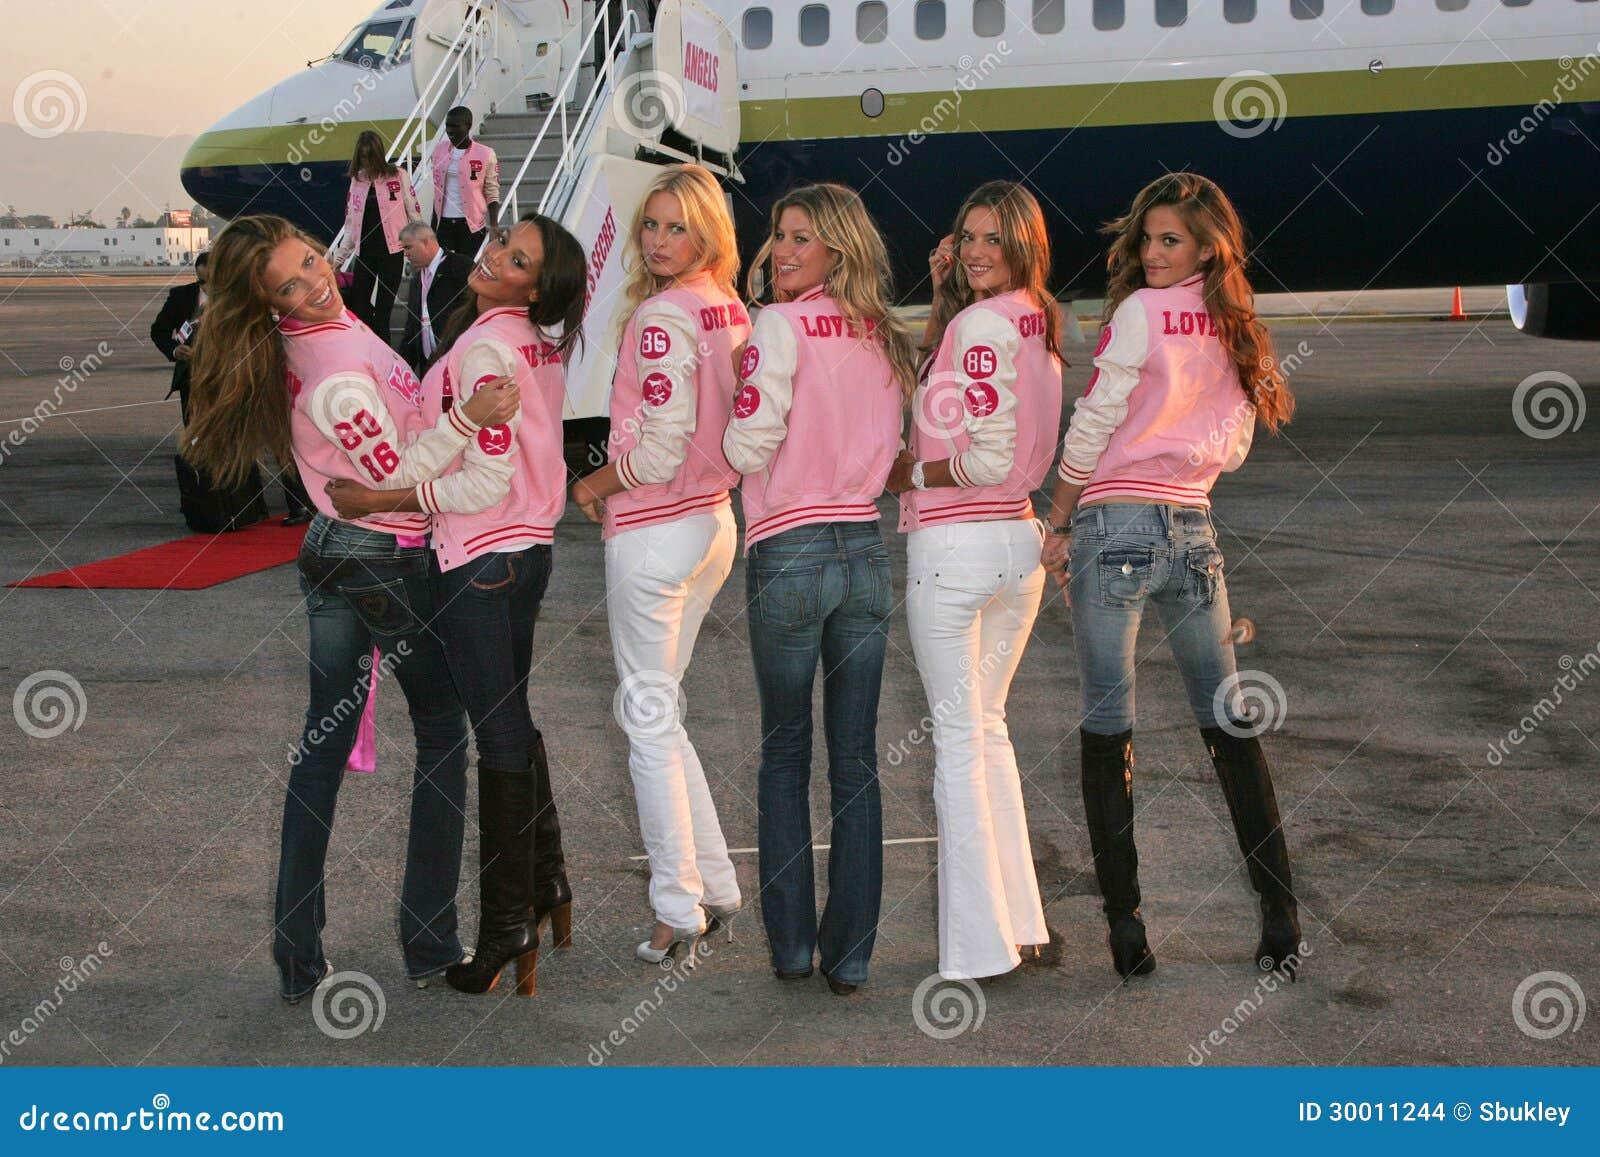 Victoria's Secret,Selita Ebanks,Giselle,Adriana Lima ...